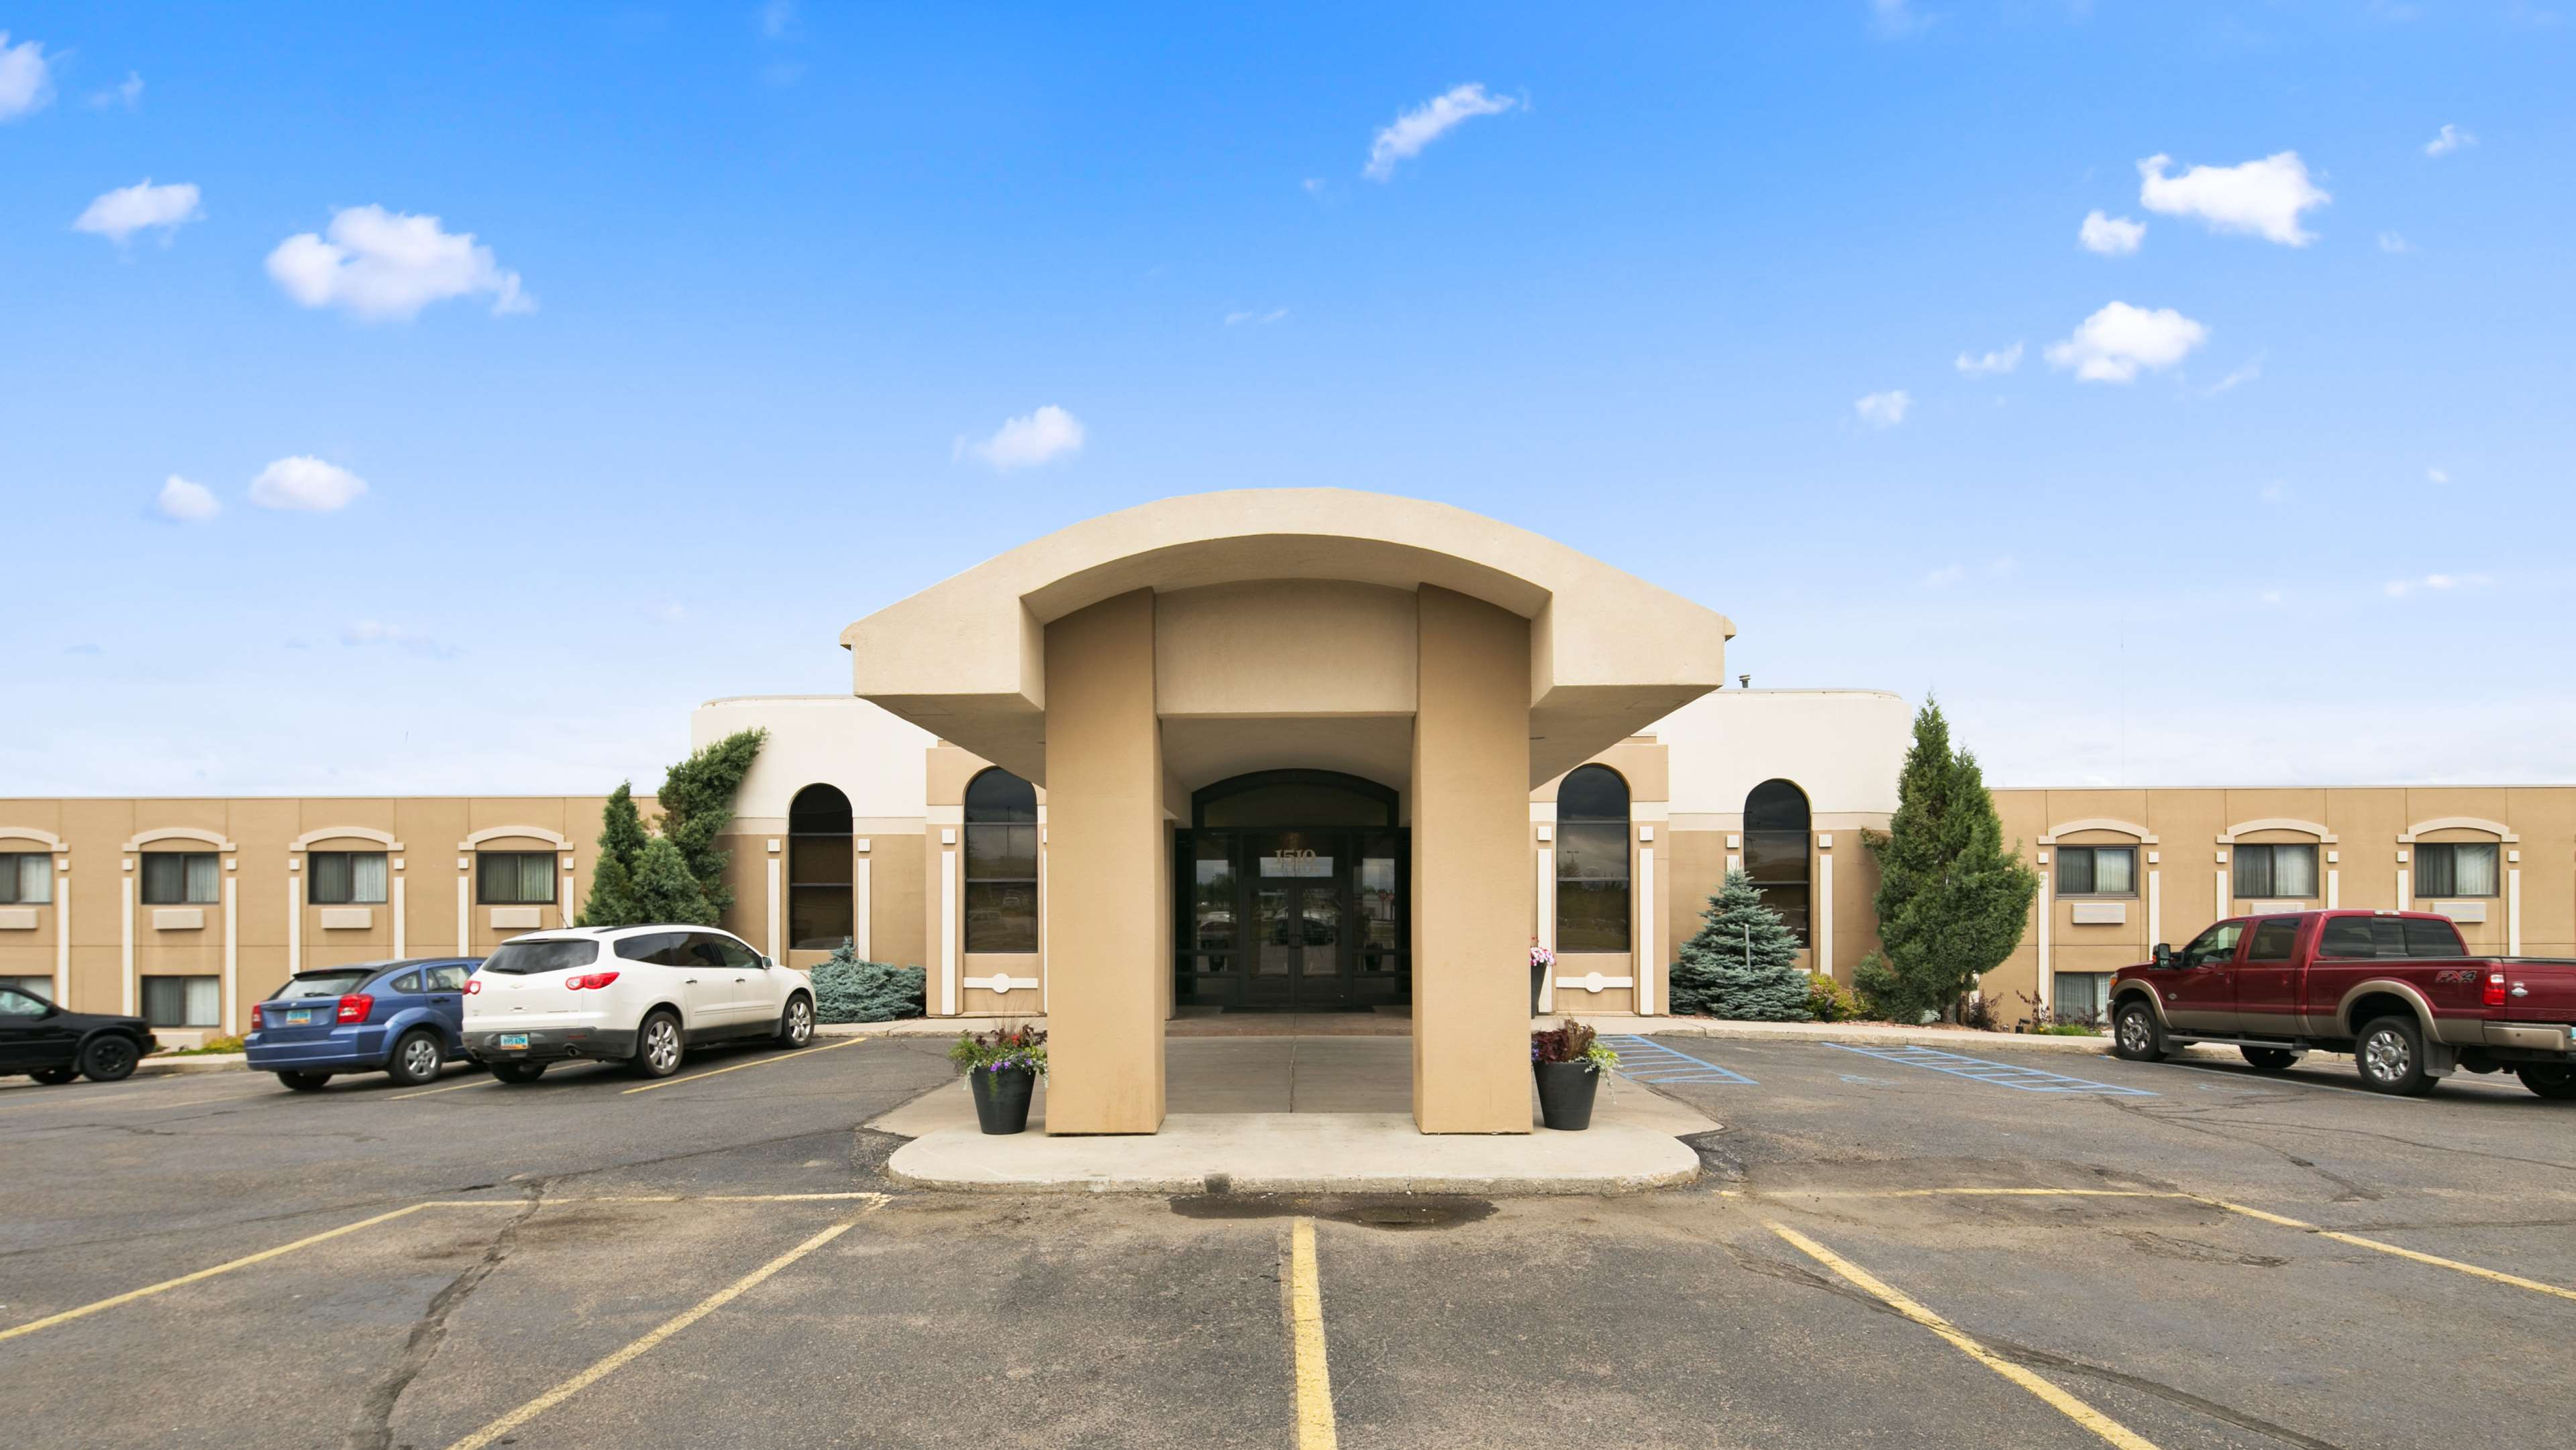 Best Western Hotels In Minot North Dakota